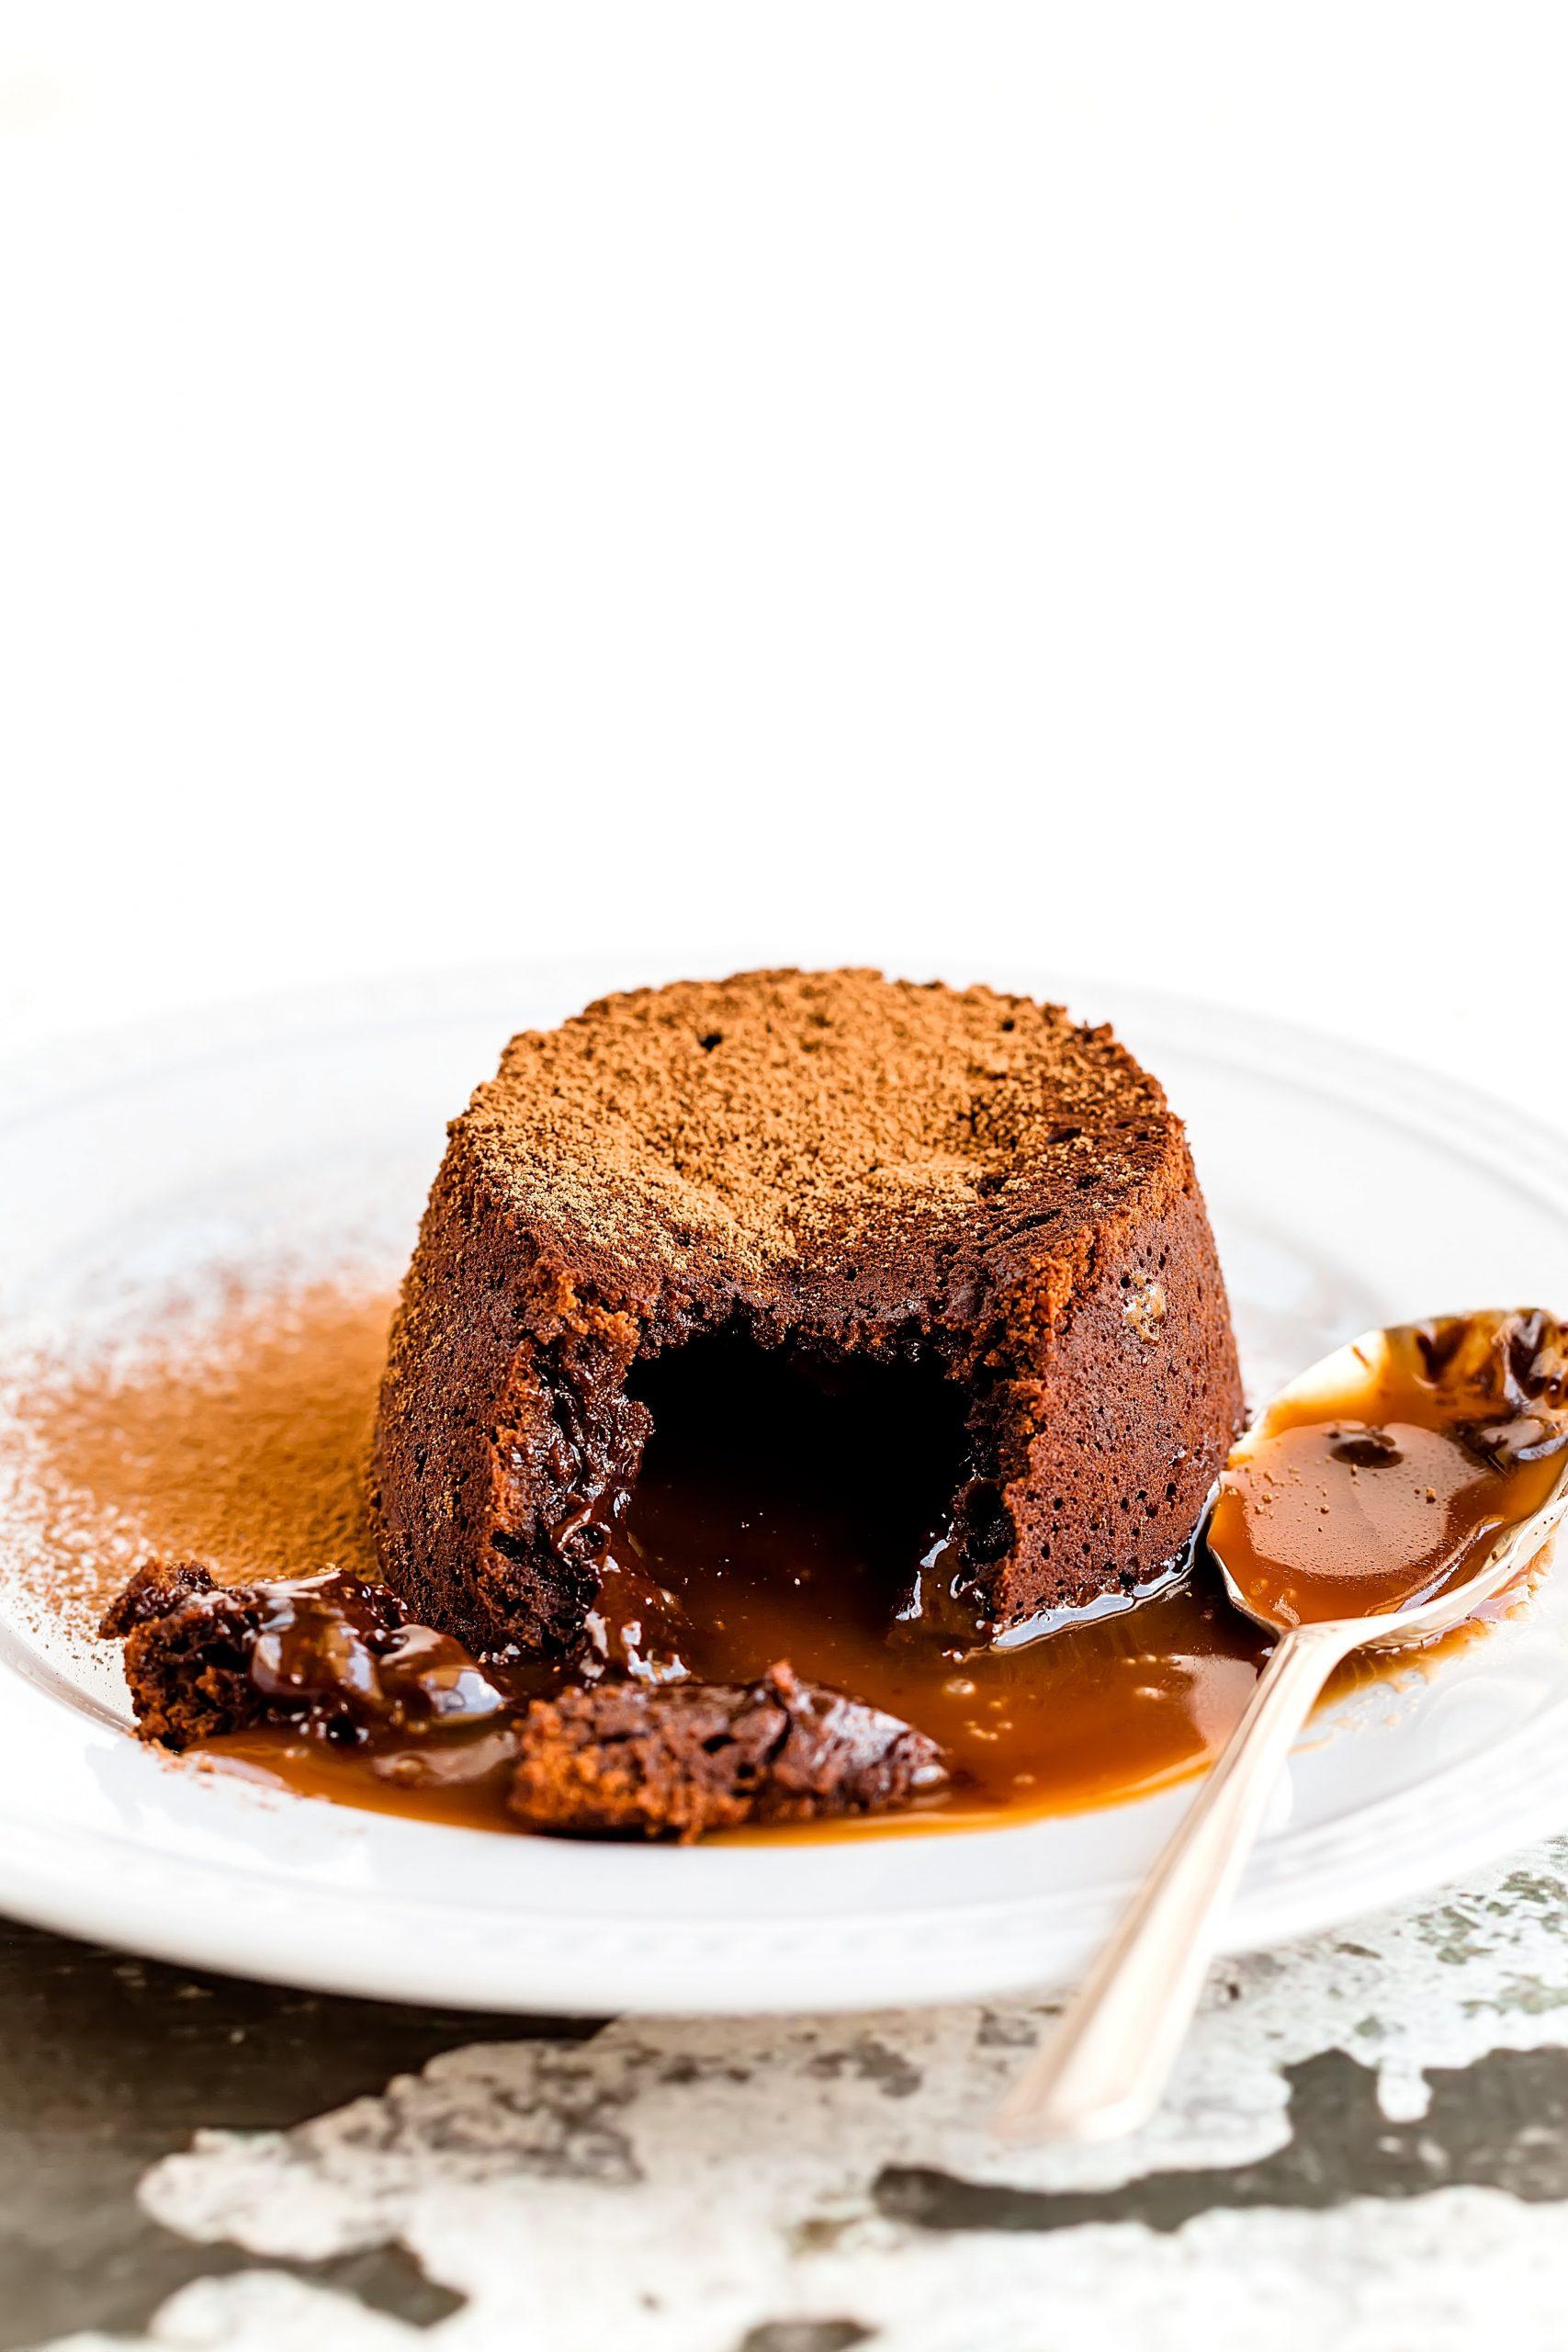 6 Rekomendasi Masakan Dessert